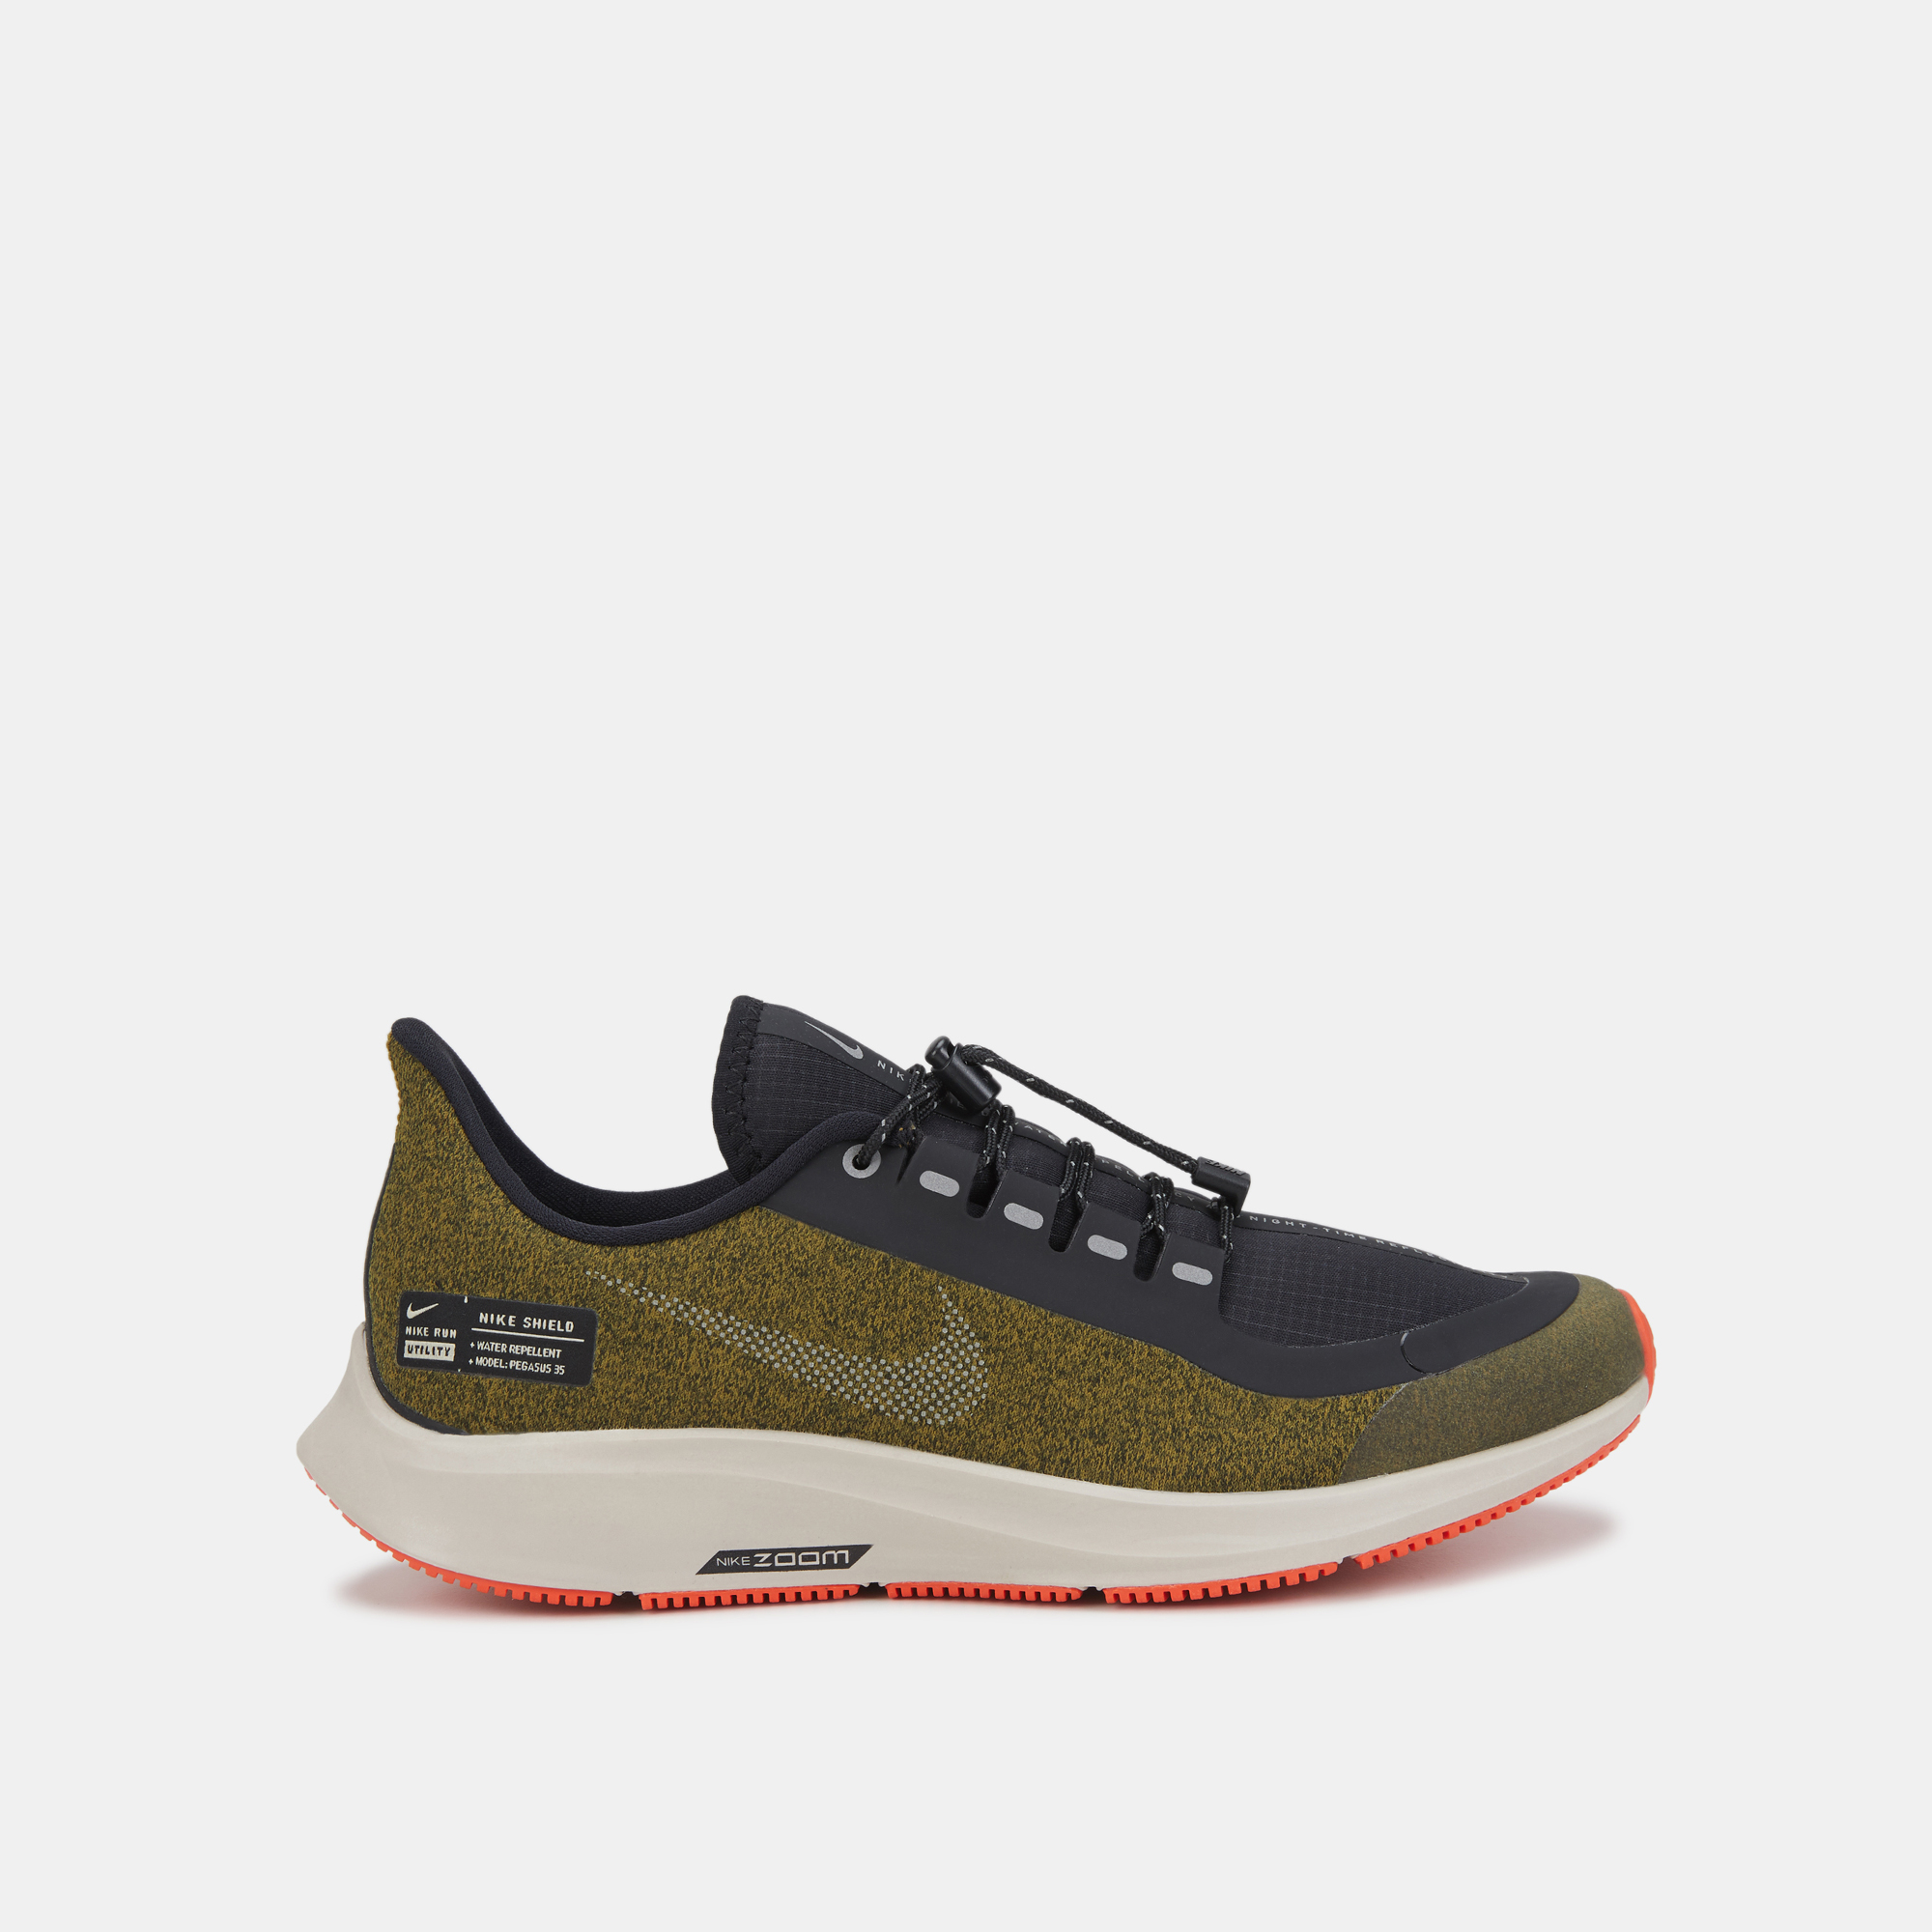 new product e7f7f 206a0 Nike Kids' Air Zoom Pegasus 35 Shield Shoe (Older Kids)